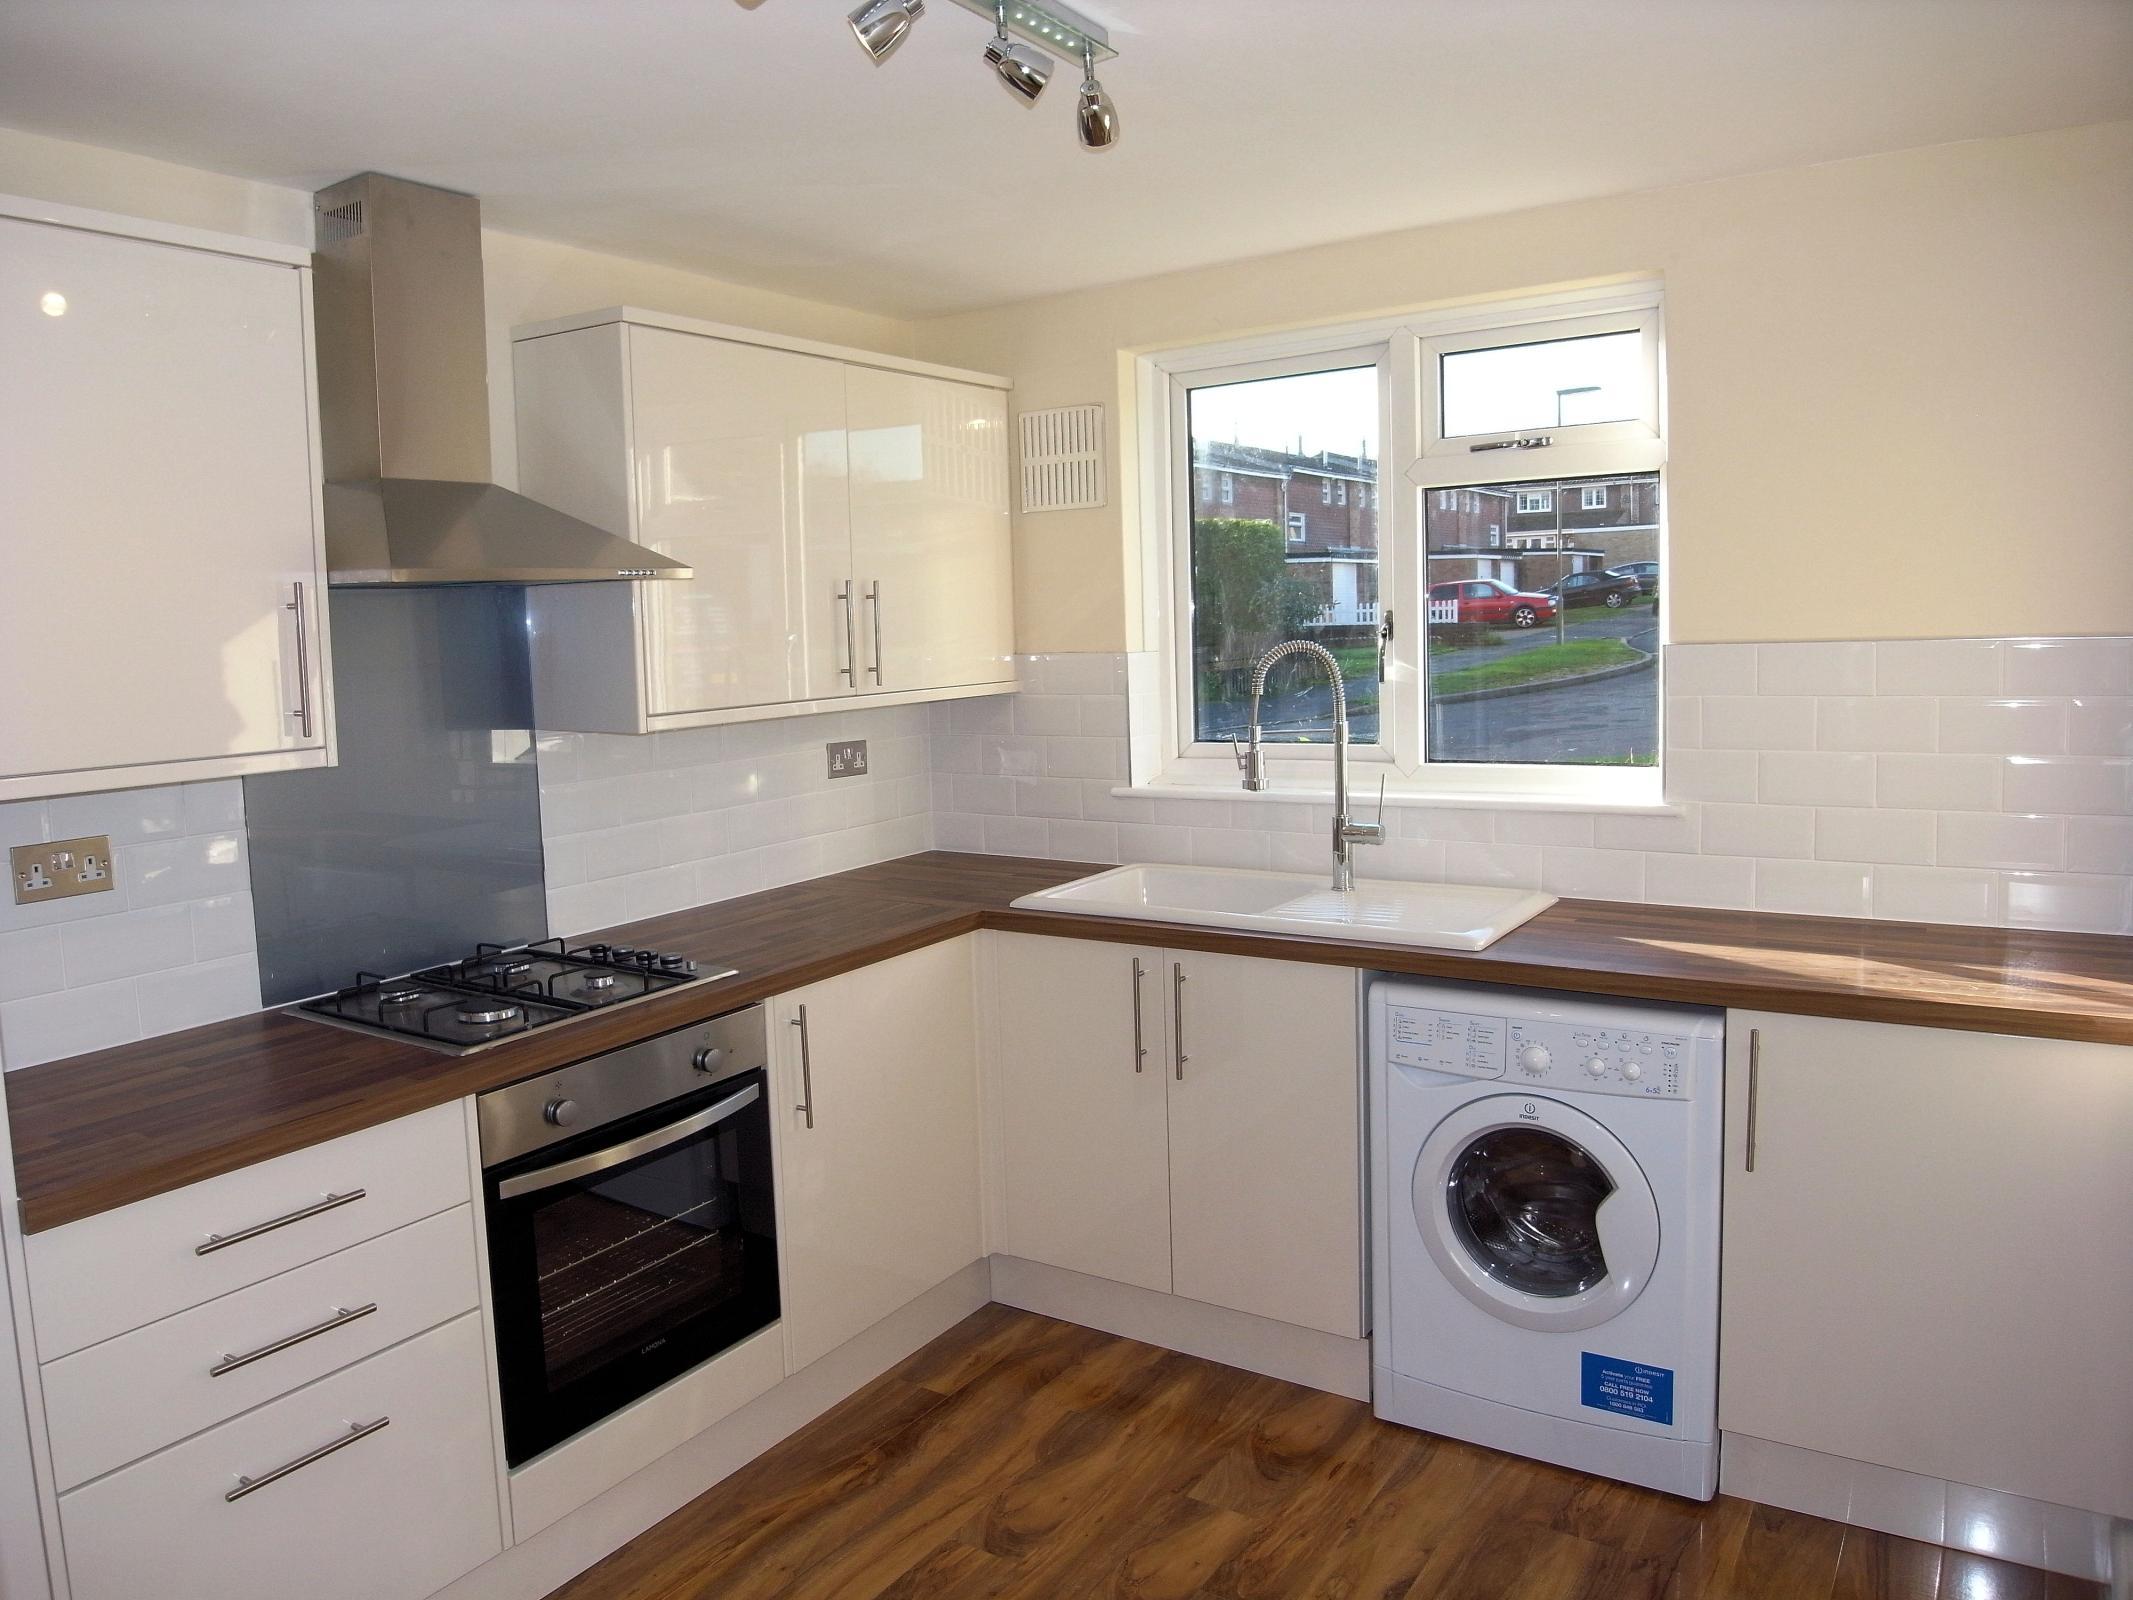 2 Bedrooms Apartment Flat for sale in Rowan Close, Guildford, Surrey, GU1